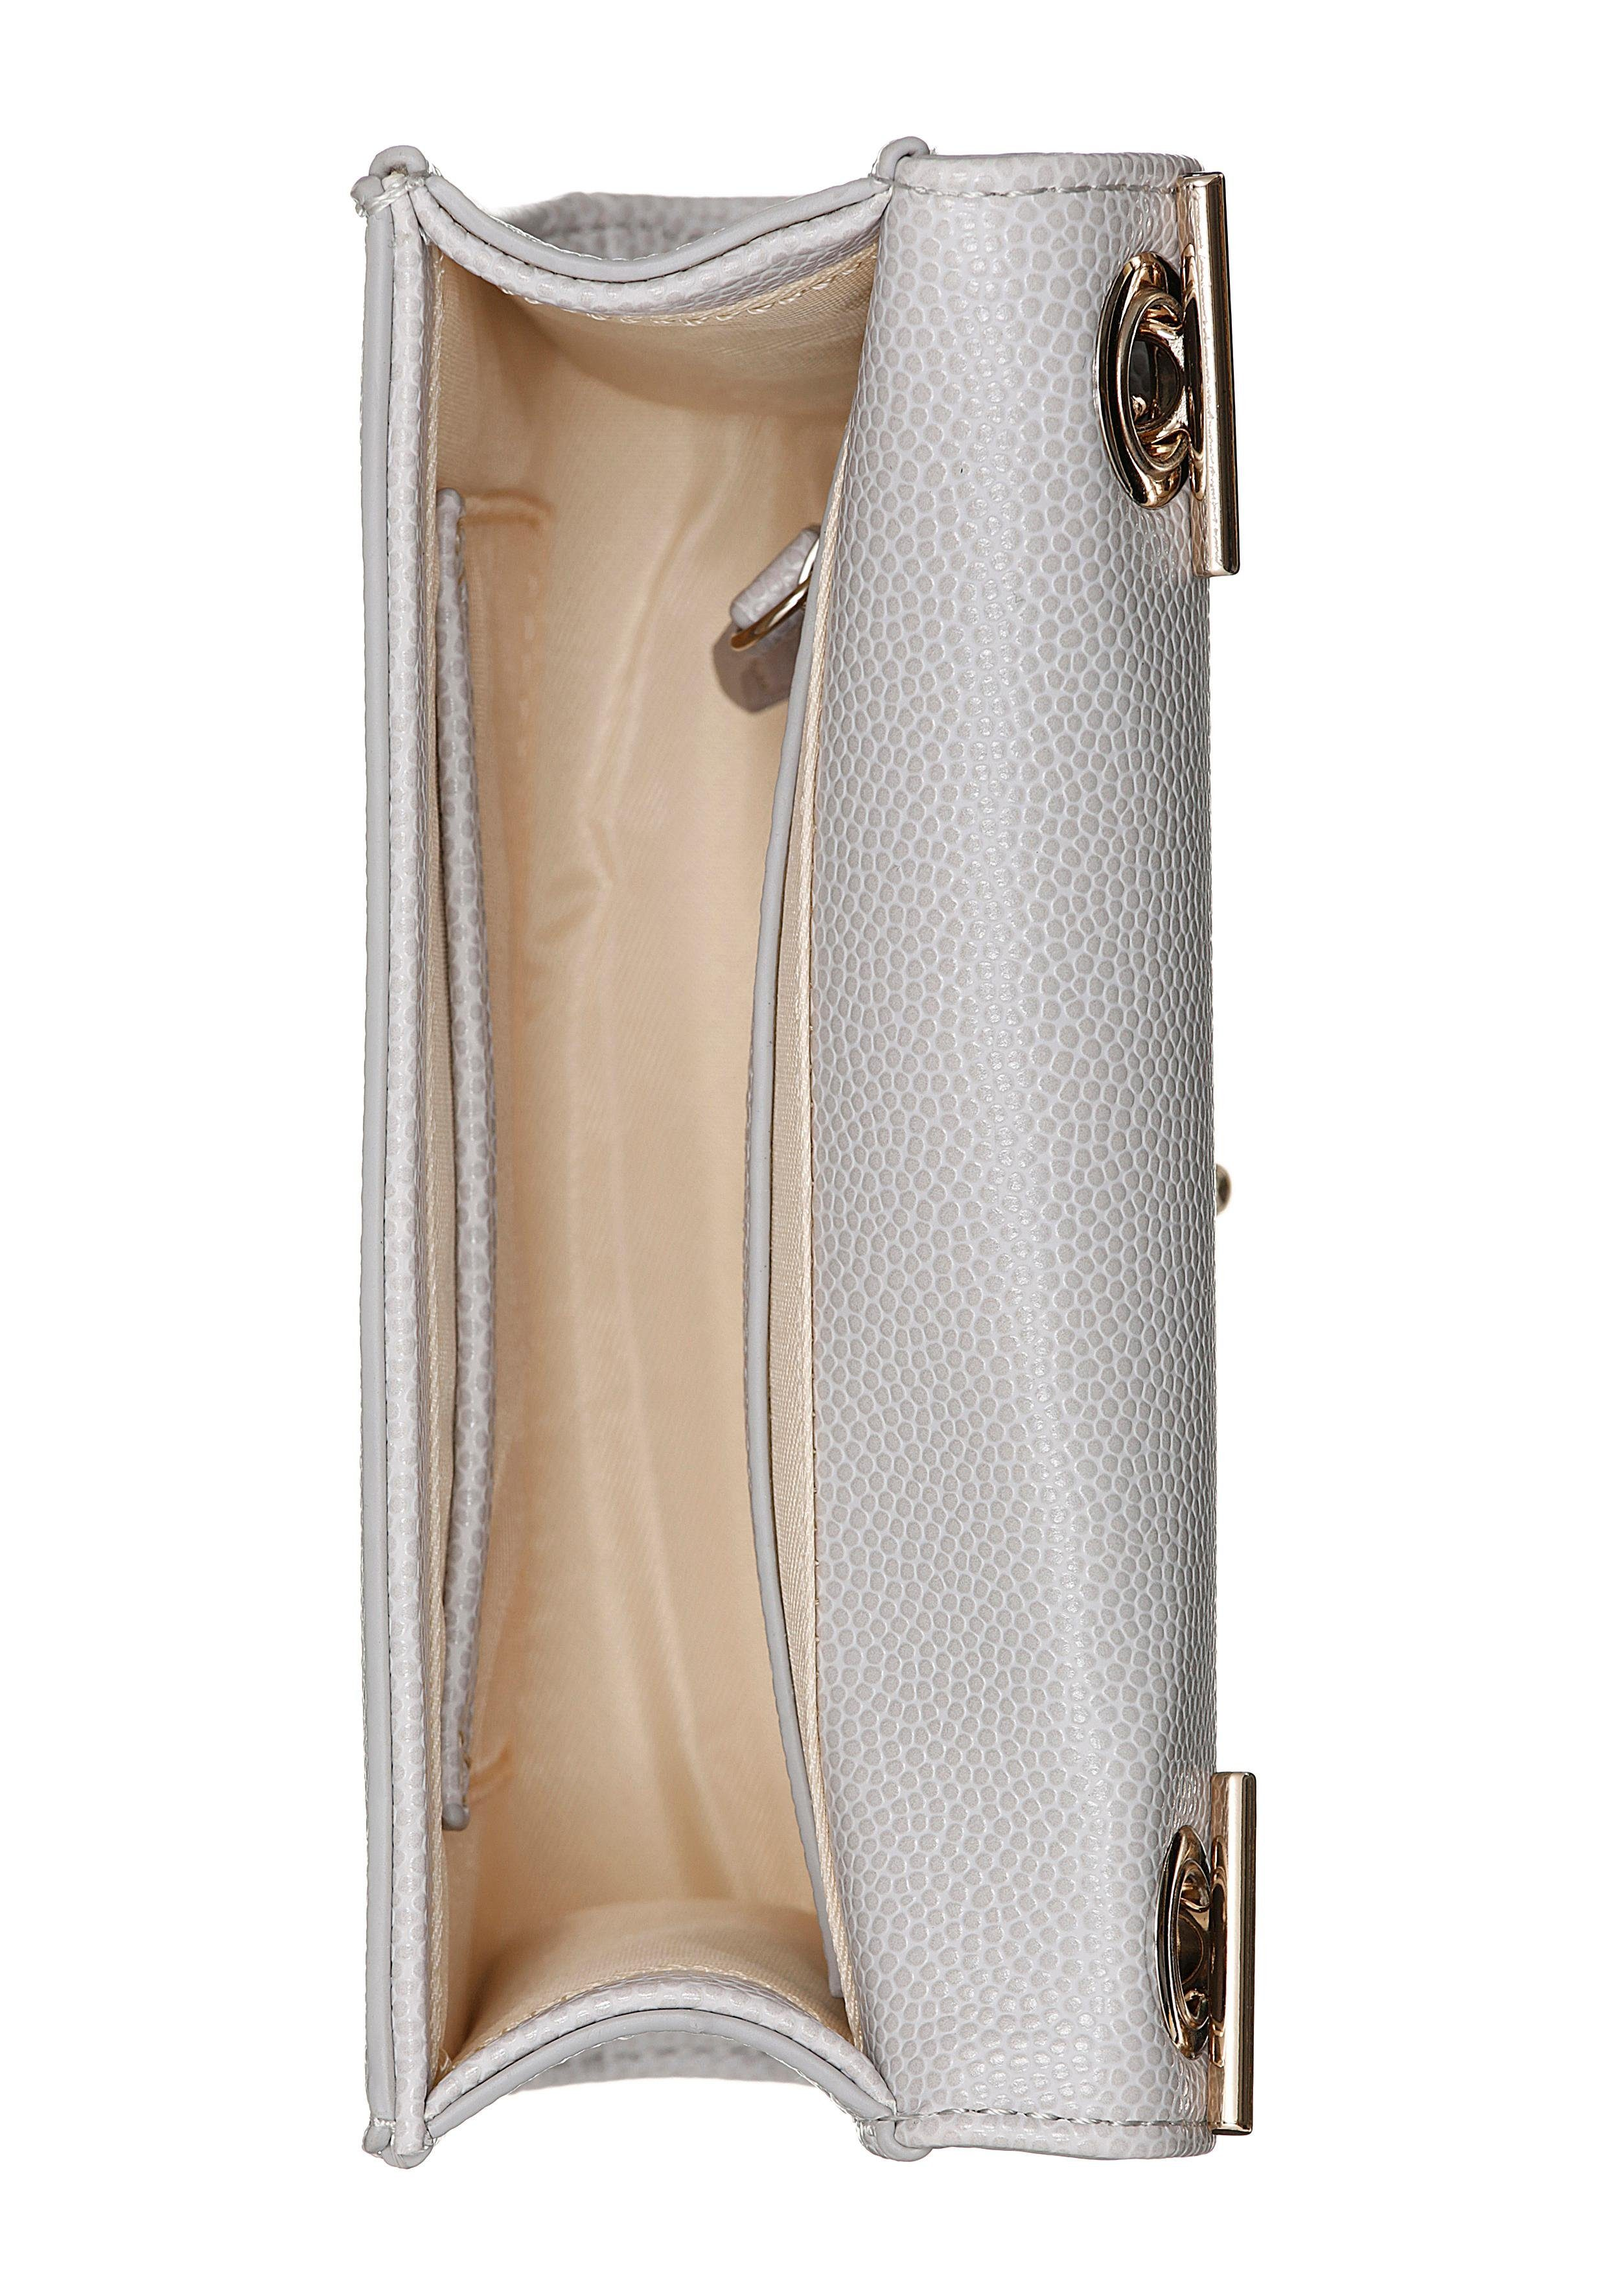 Clutch Valentino Valentino Clutch Handbags Valentino Handbags Clutch Handbags Valentino Handbags Clutch T4qxwUSf5S